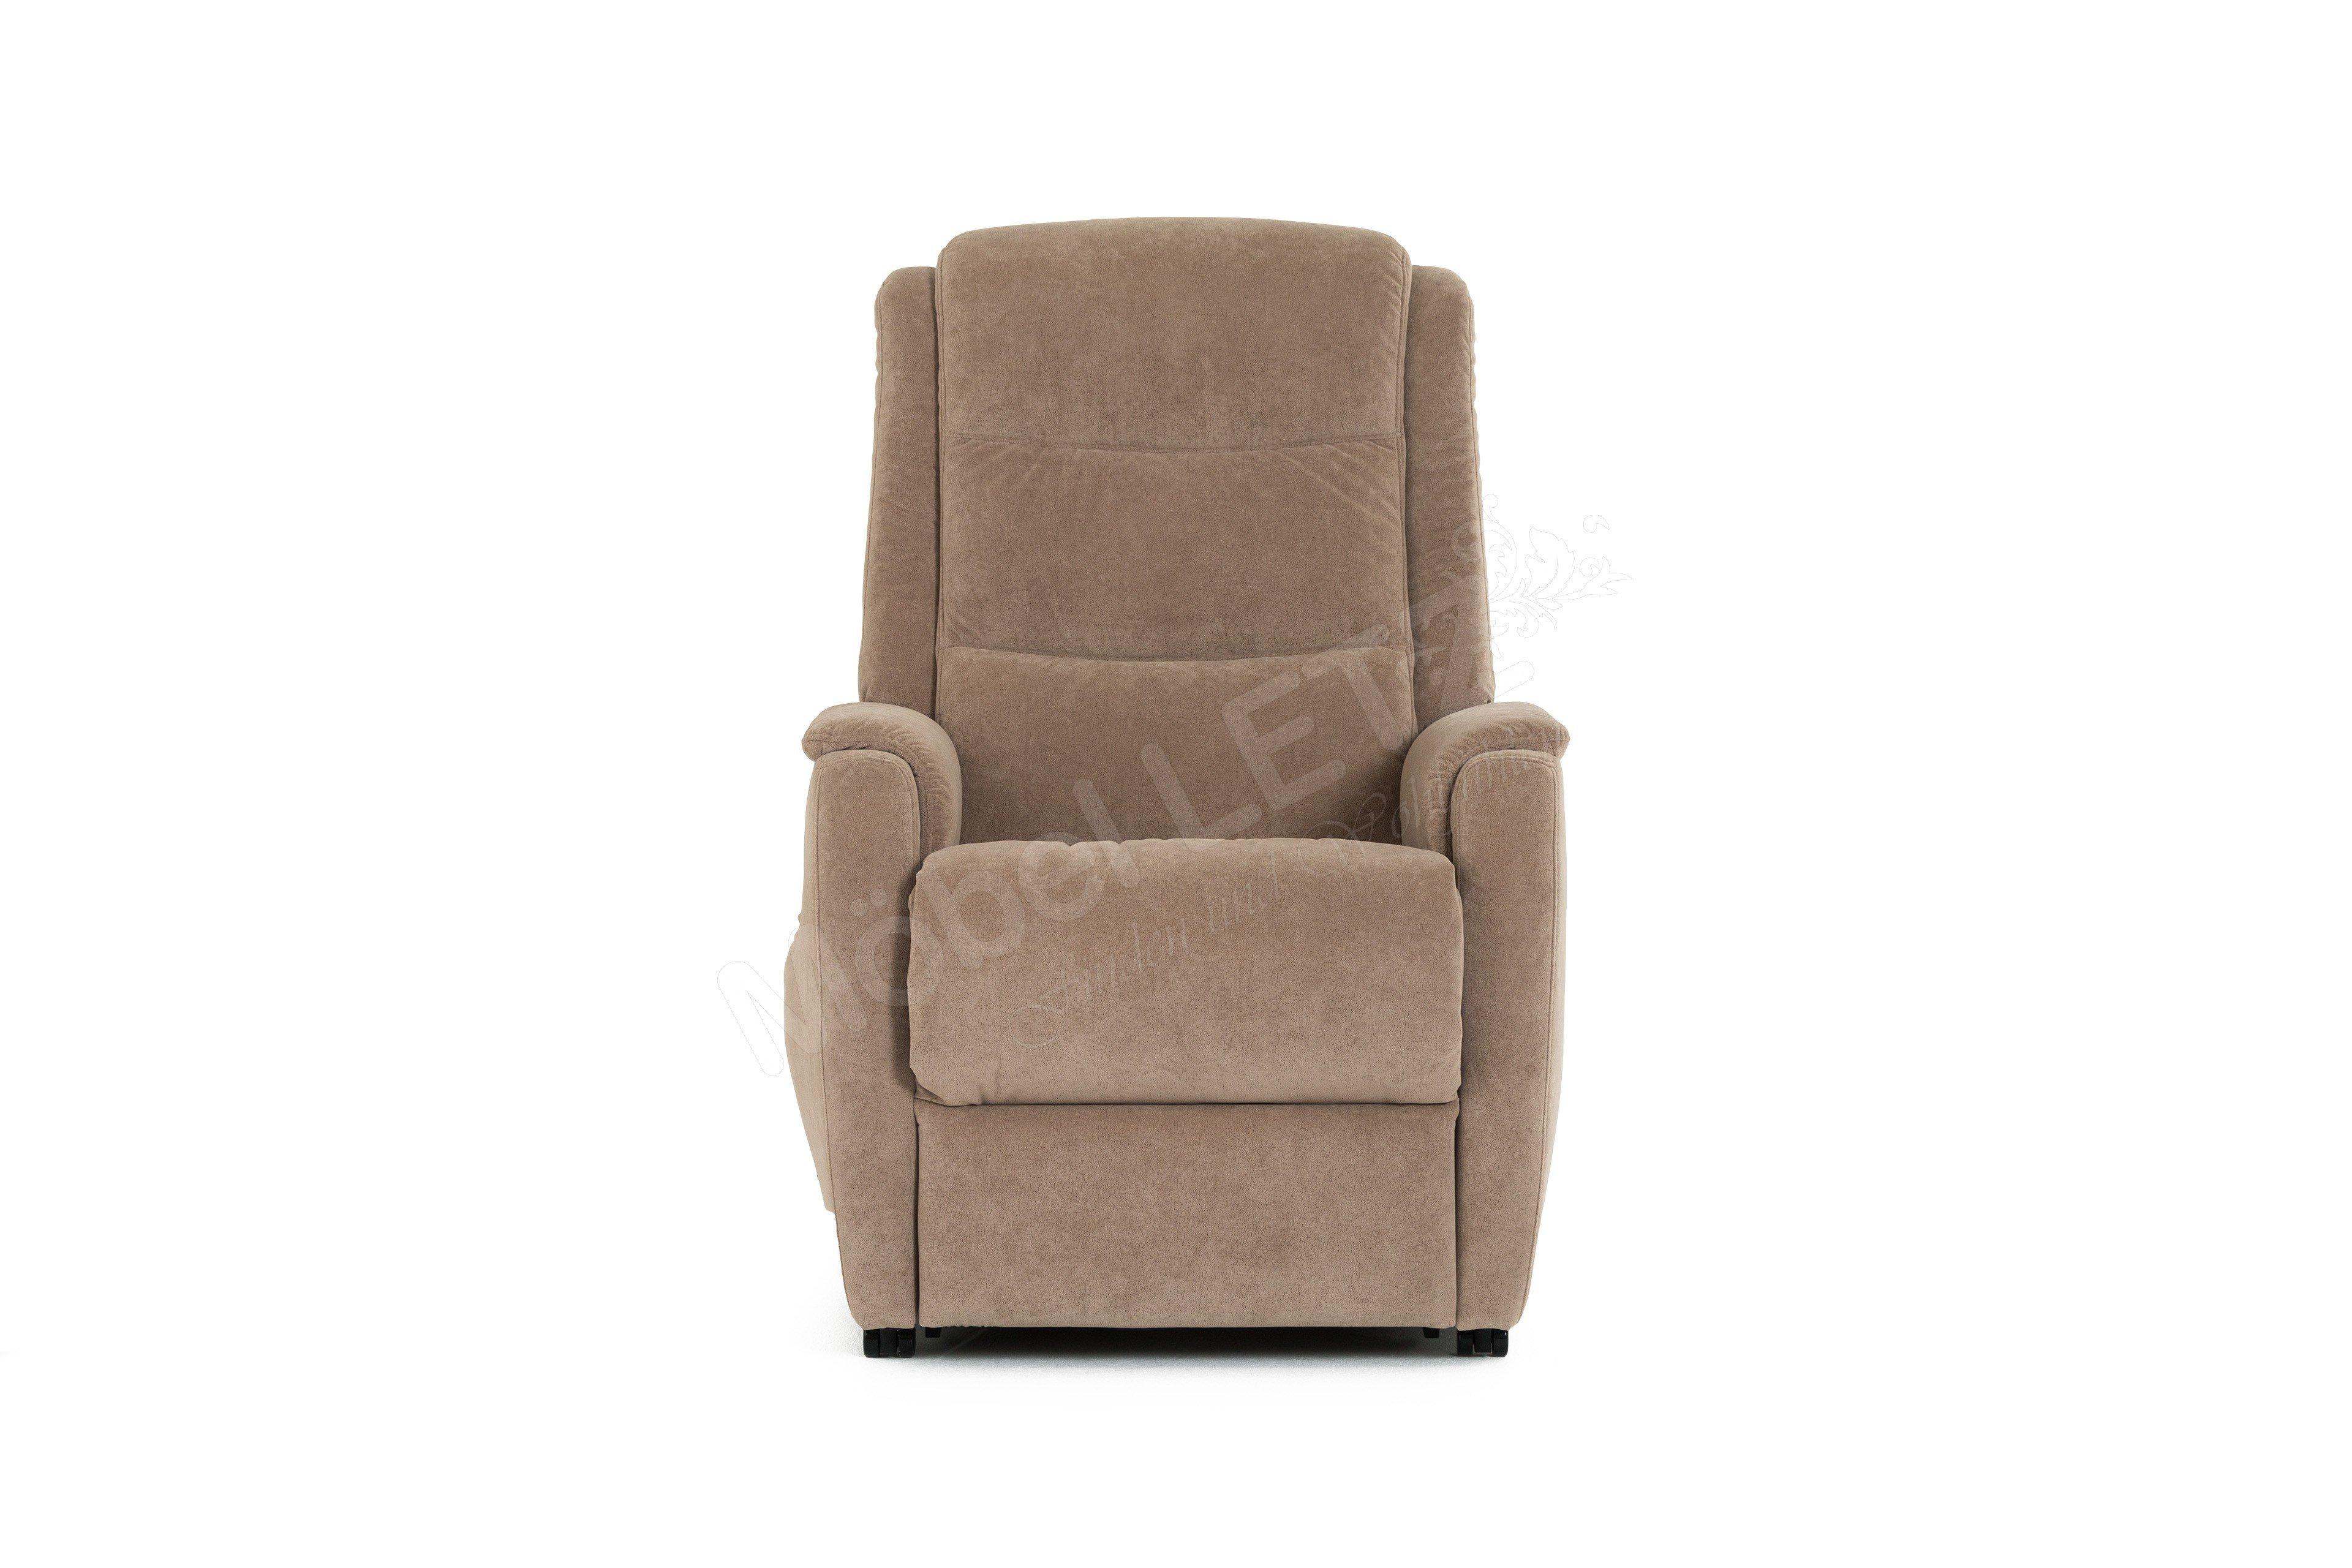 hukla relaxsessel rv82 in hellbraun m bel letz ihr online shop. Black Bedroom Furniture Sets. Home Design Ideas